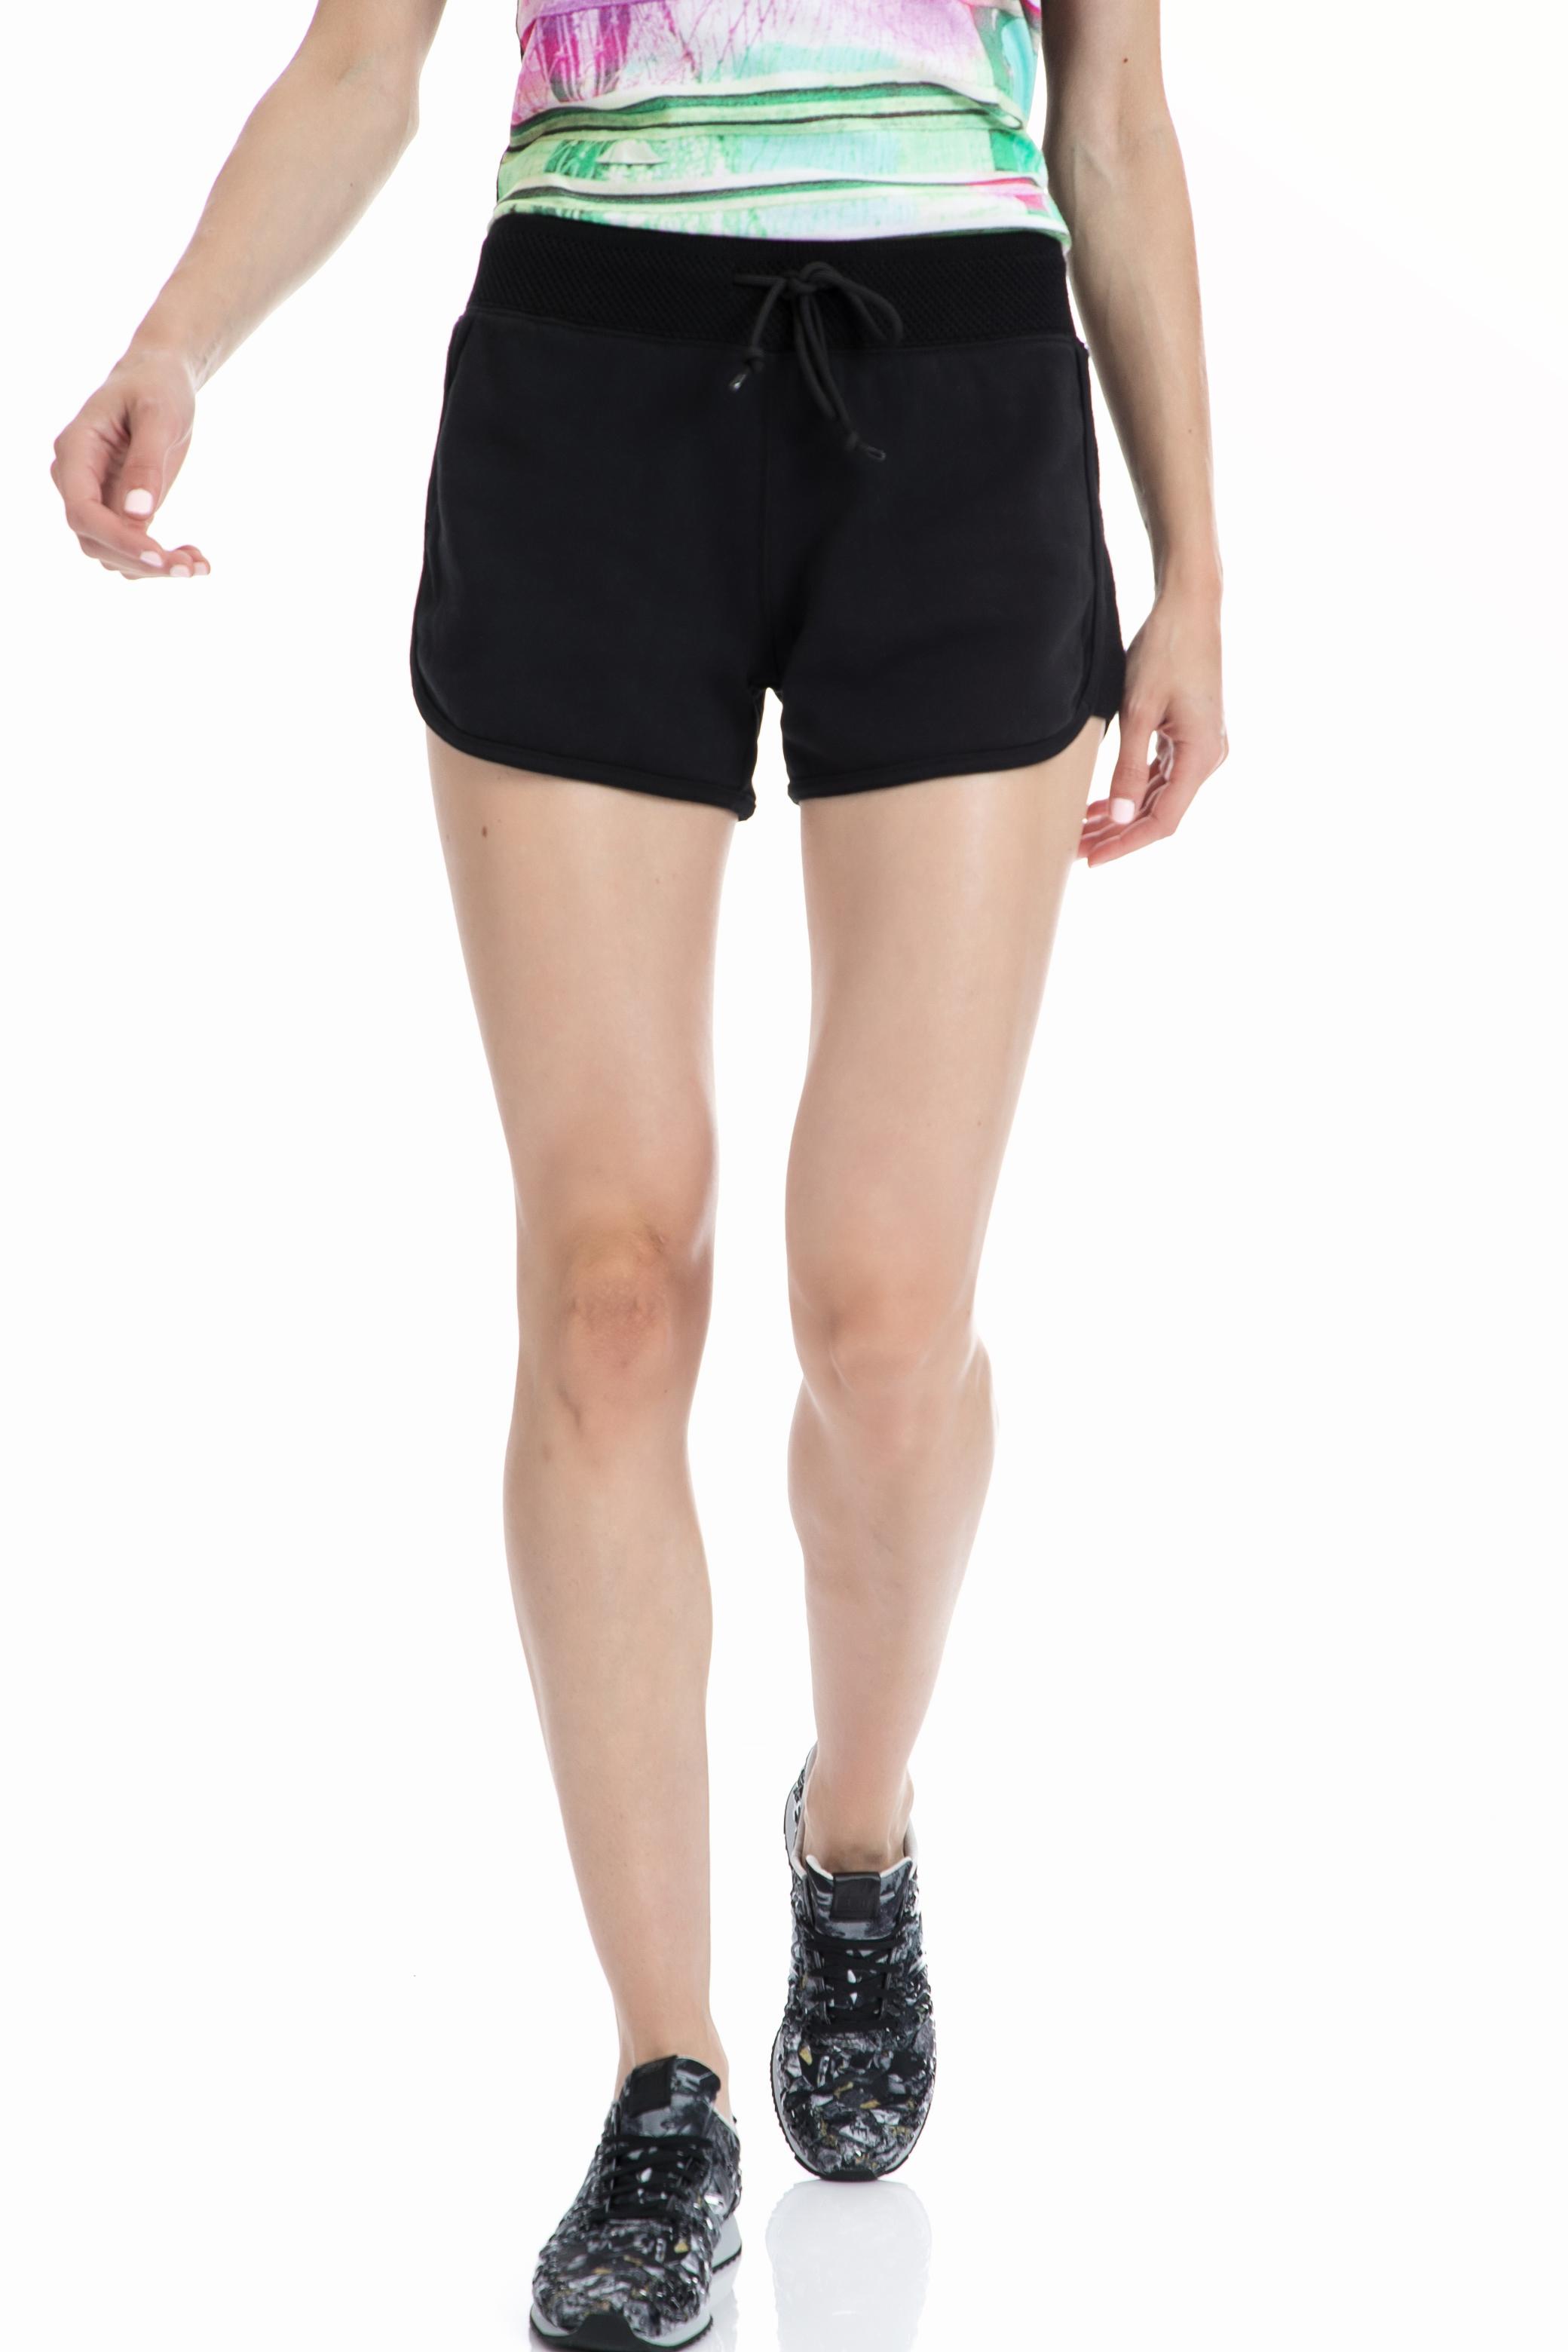 CONVERSE - Γυναικείο σορτς Converse μαύρο γυναικεία ρούχα σορτς βερμούδες αθλητικά